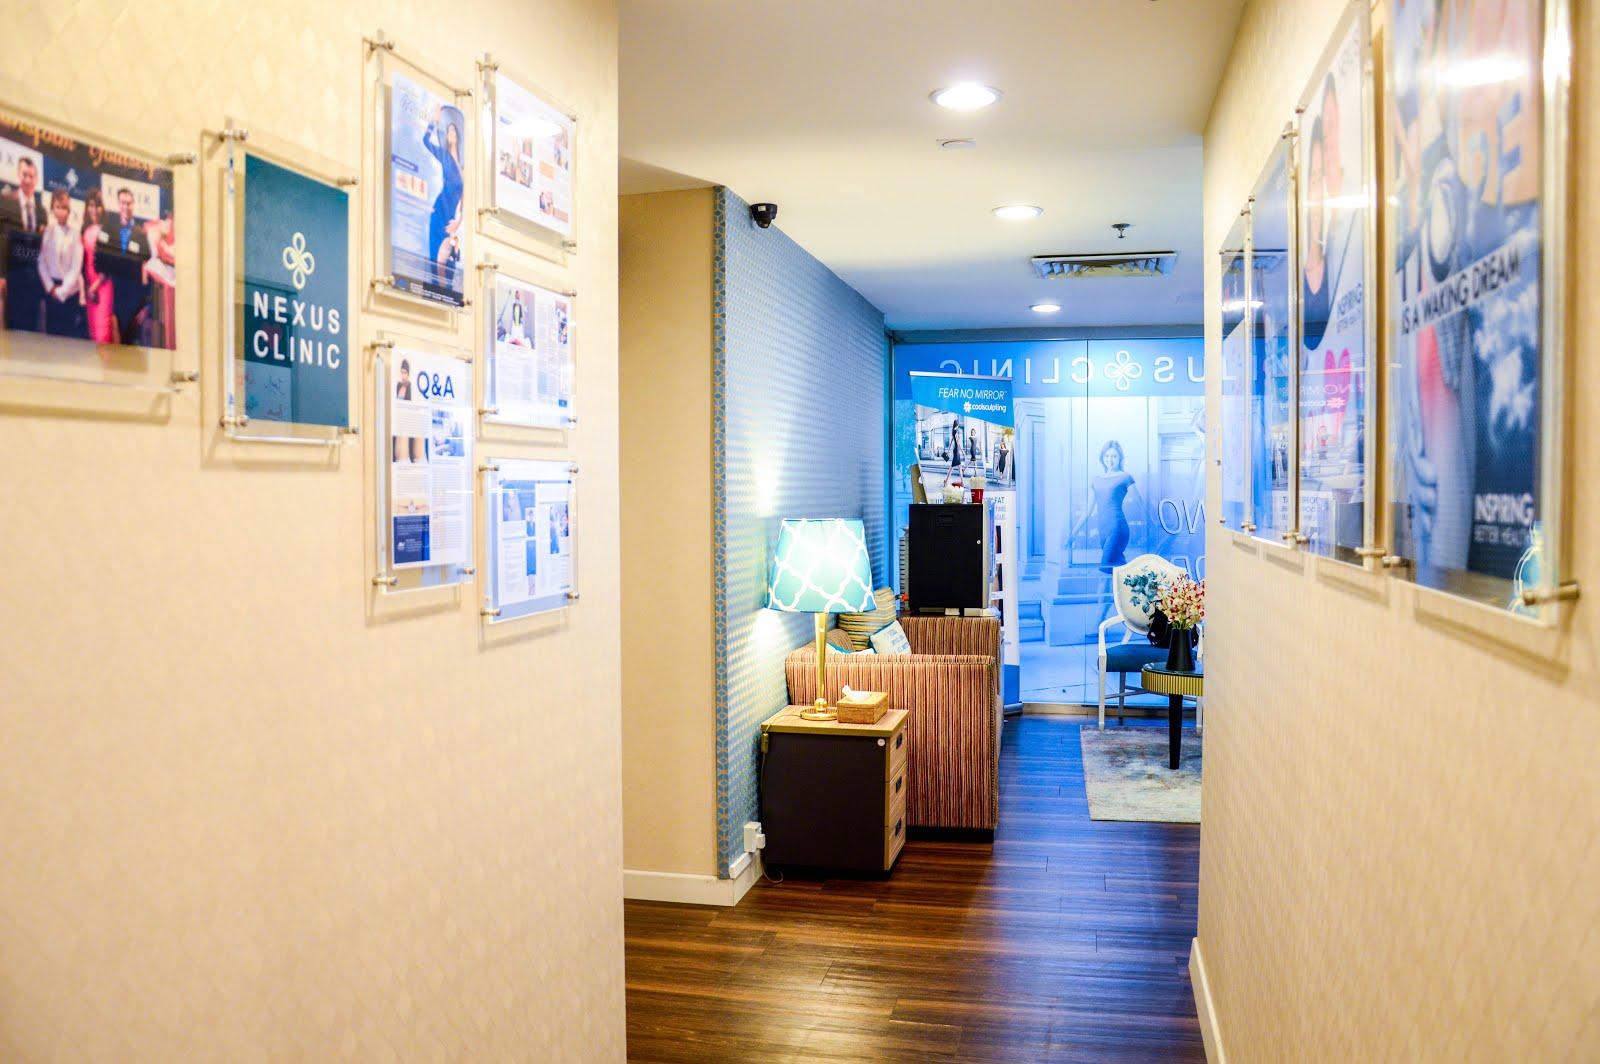 nexus clinic treatment price